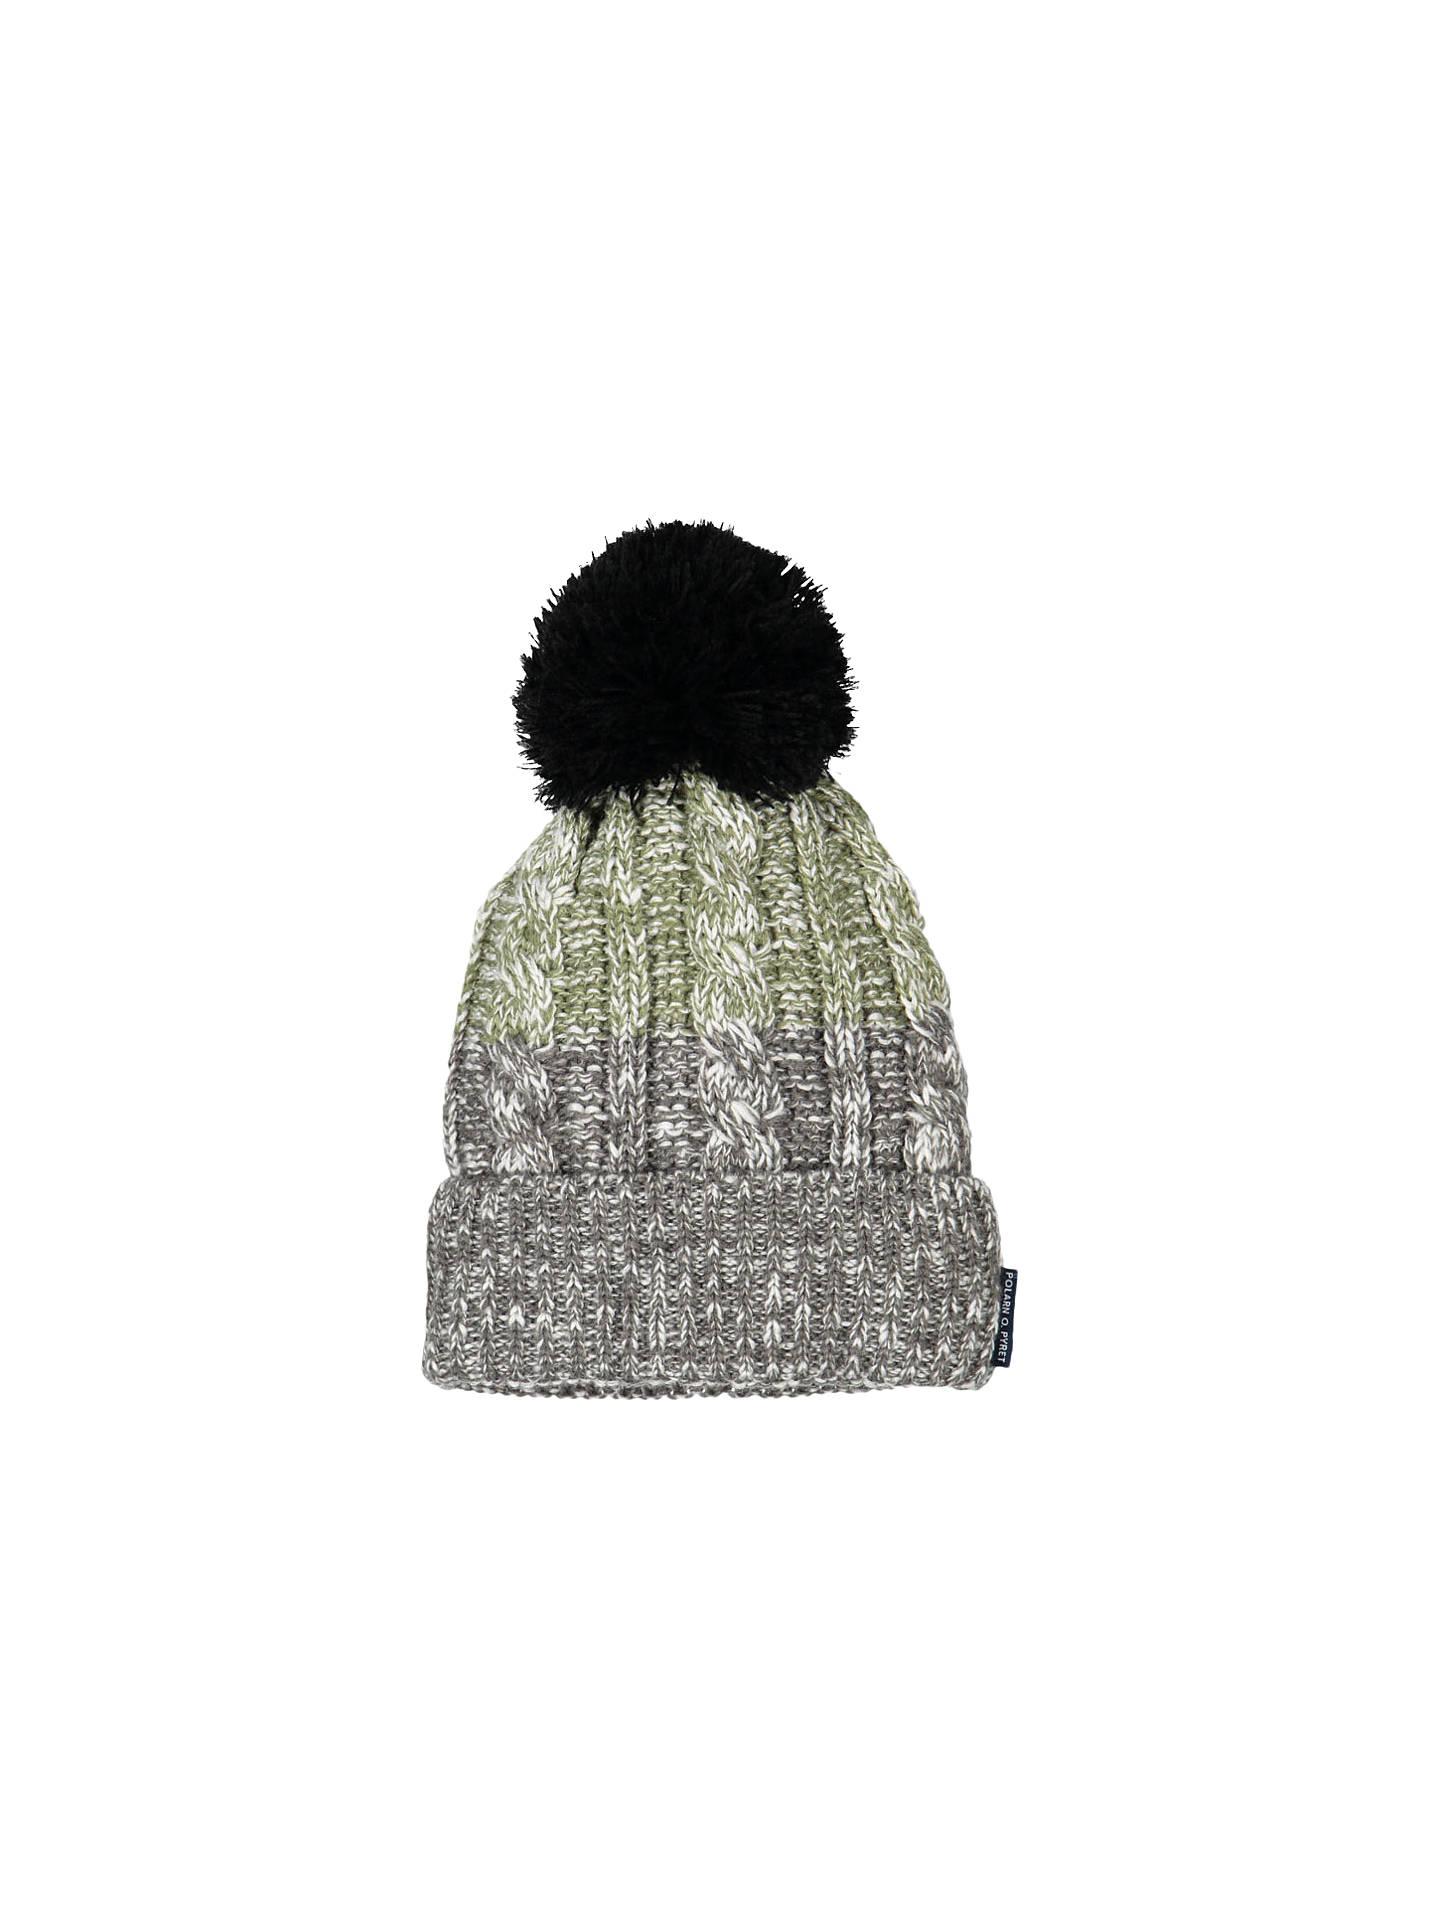 5841e0847f6 Polarn O. Pyret Children s Bobble Hat